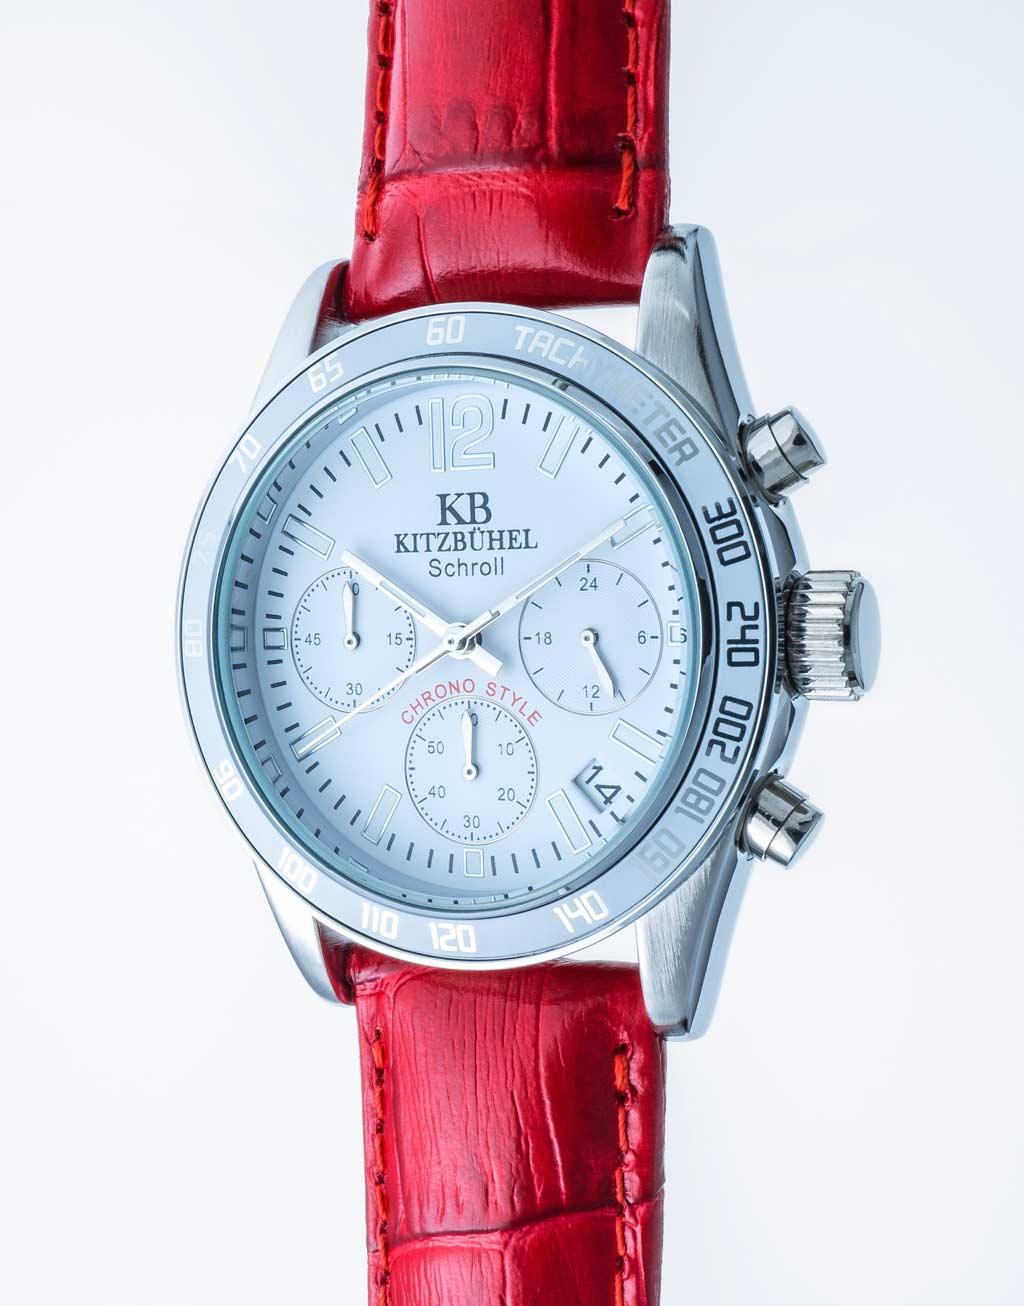 KB Uhr – Chrono Style